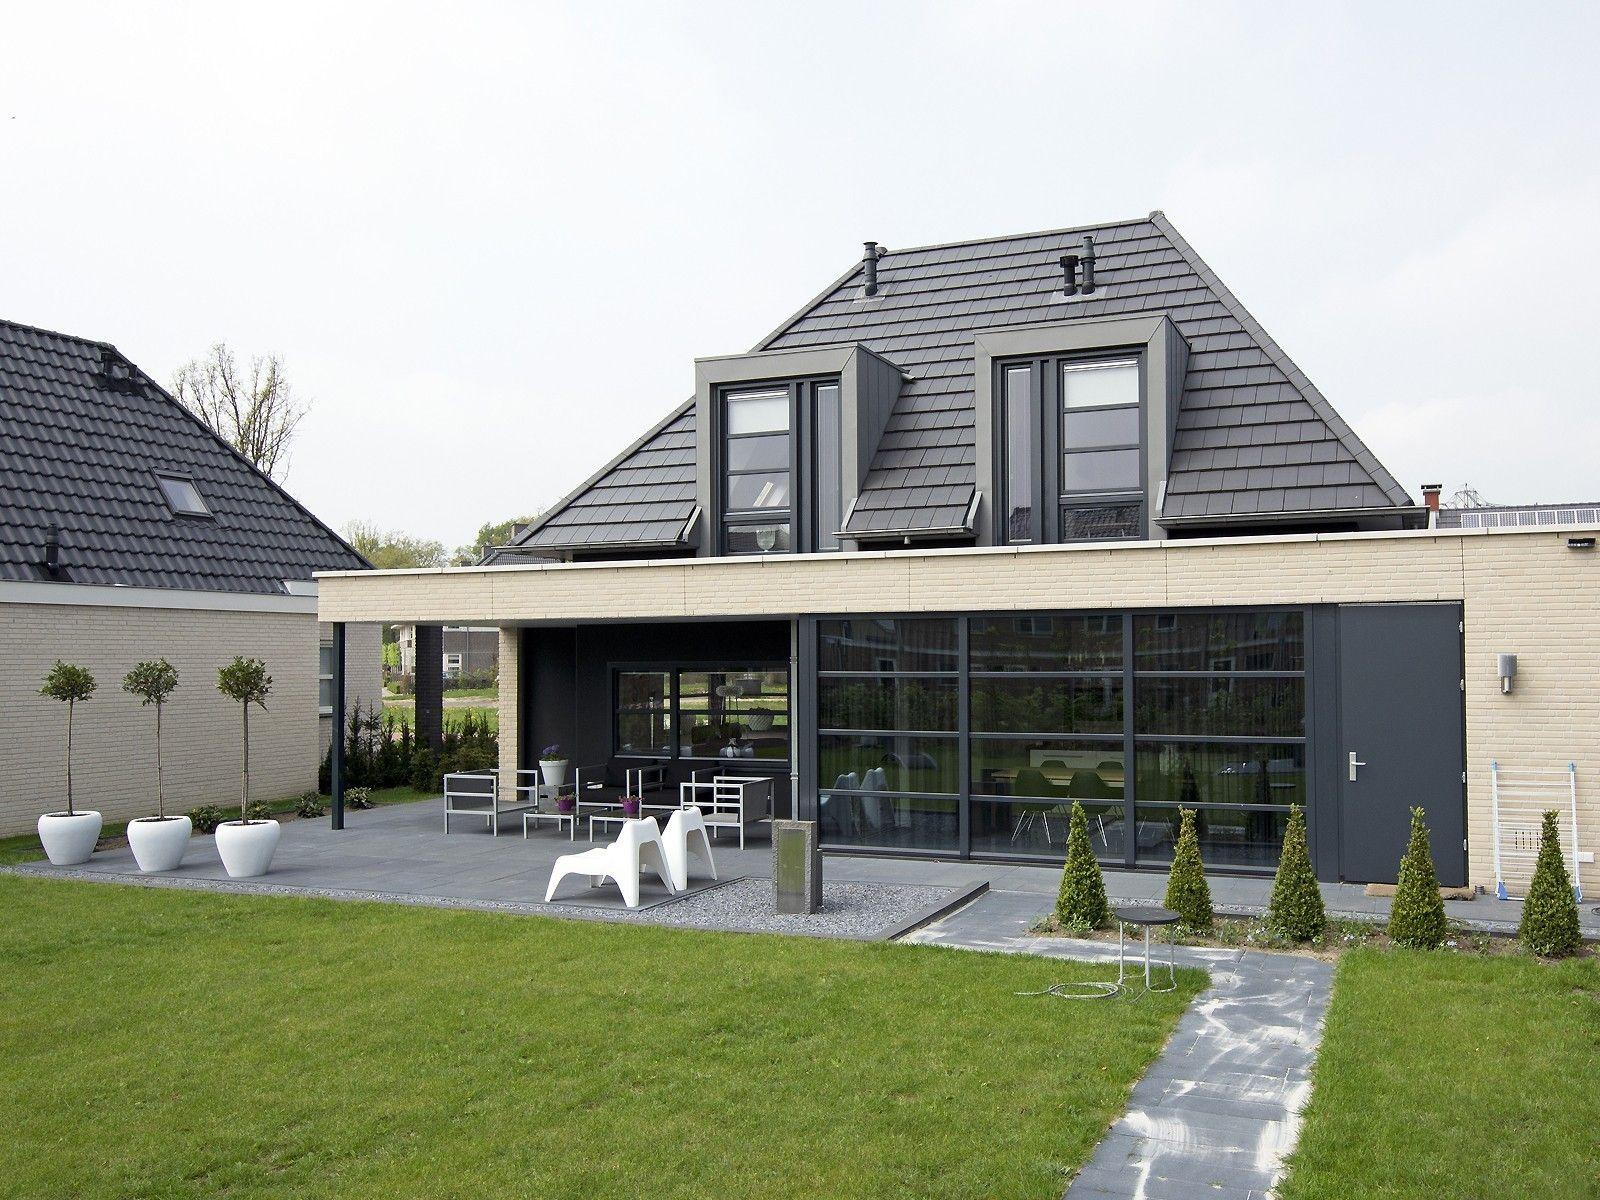 huis landelijk modern - Google Search | Building design ...